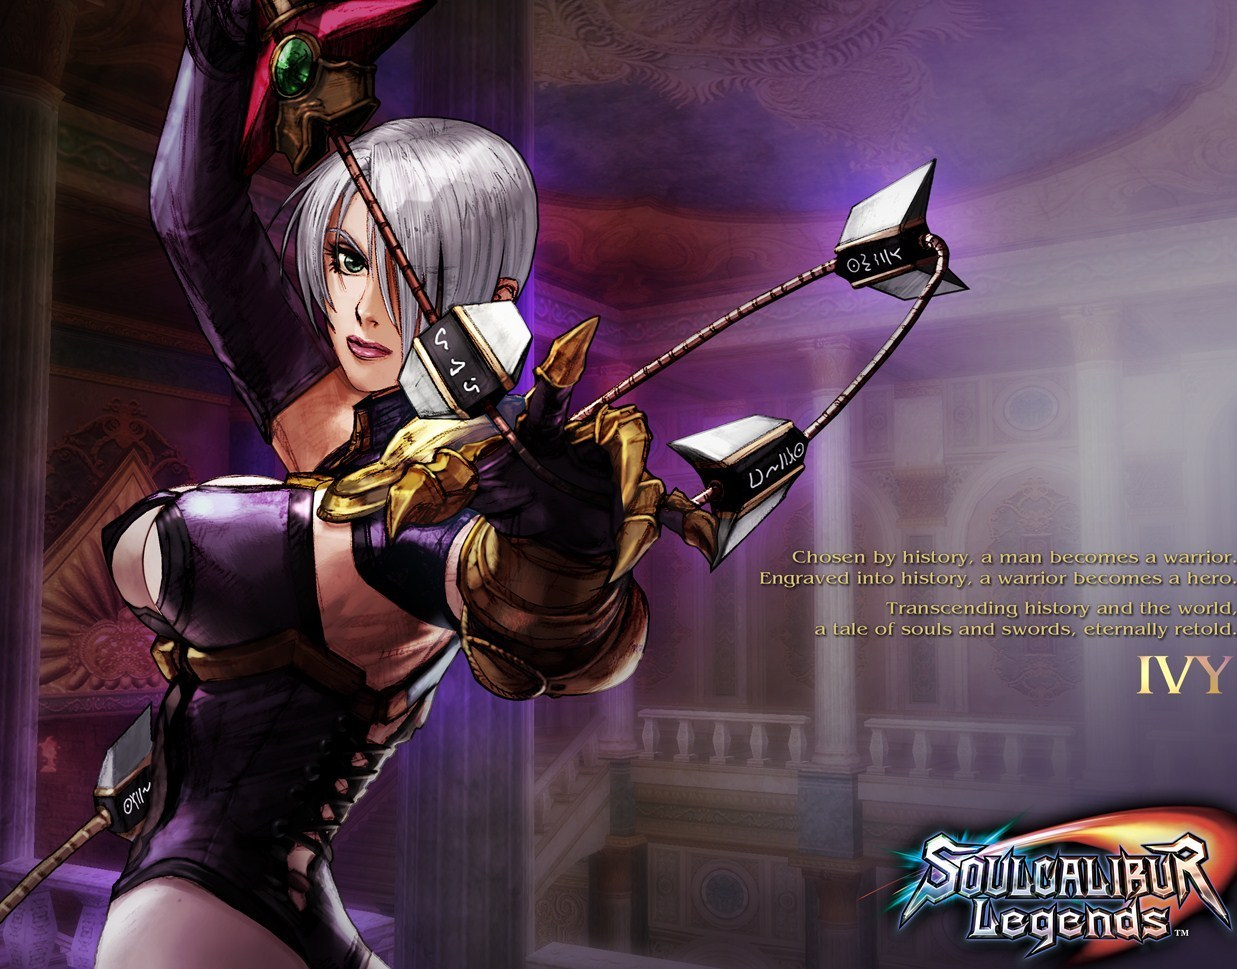 evolution of sophitia soul bladecalibur gaming